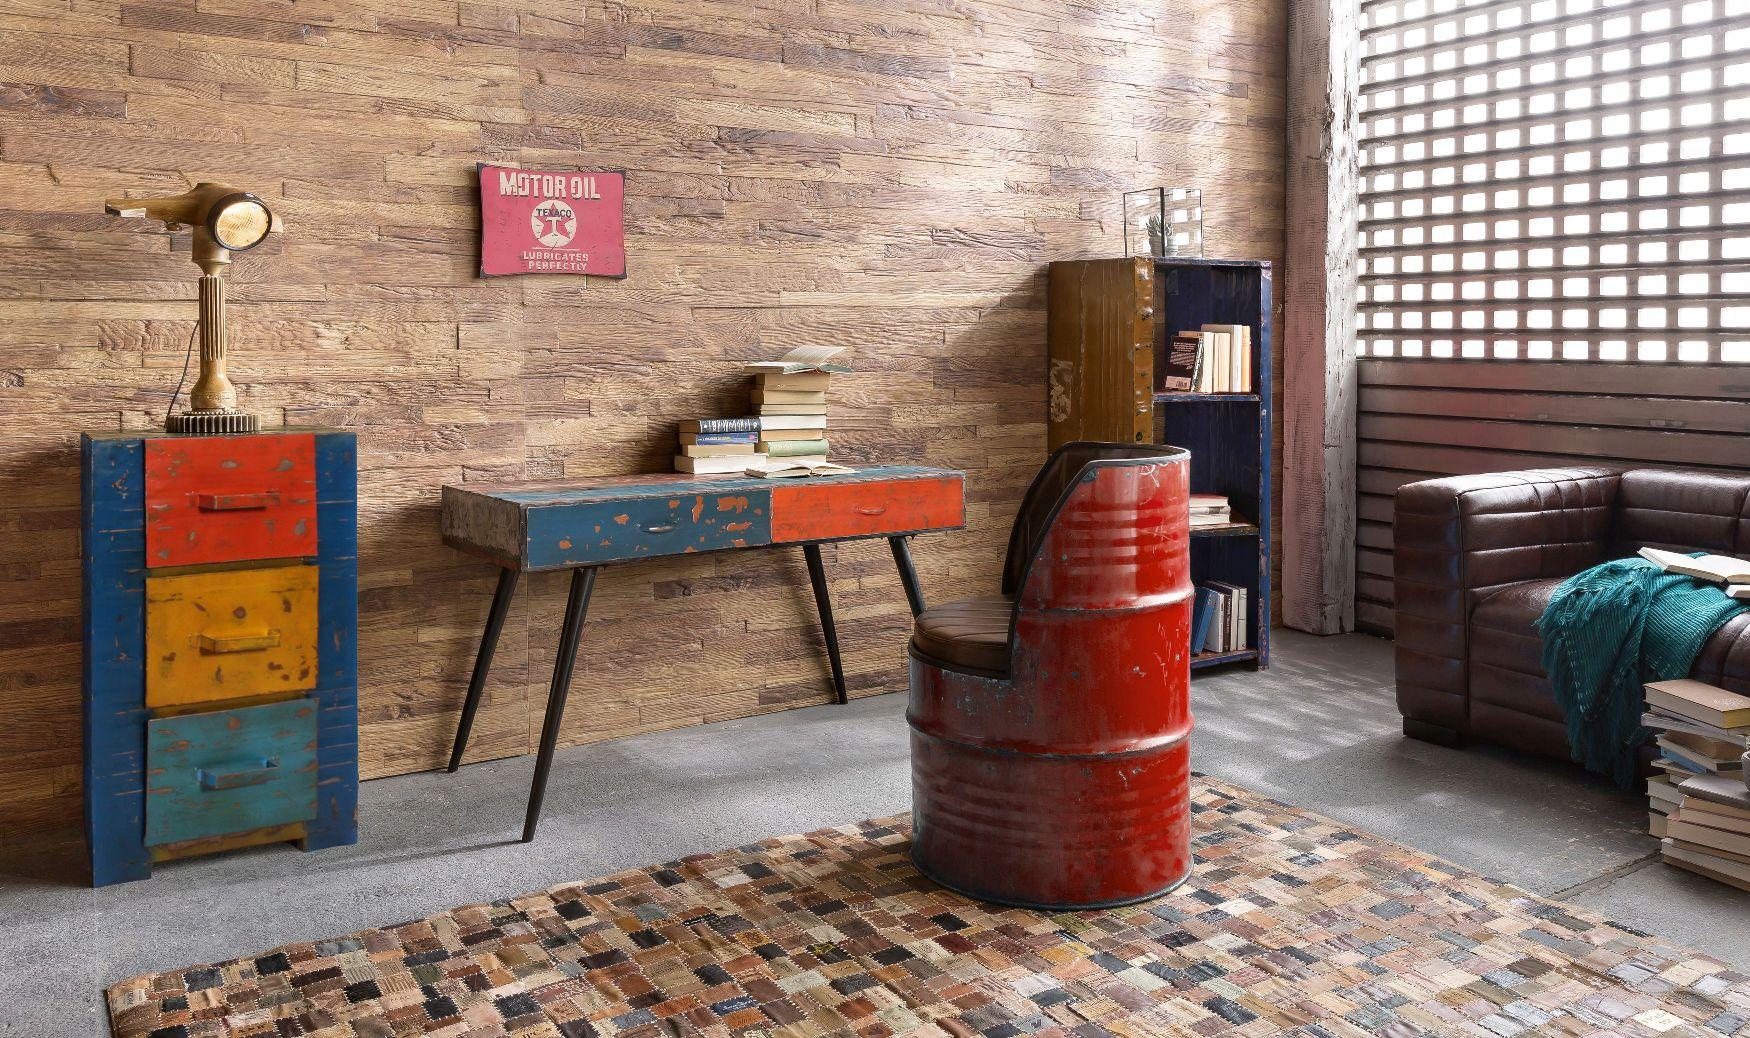 2smithers-of-stamford_oil-drum-desk.jpg